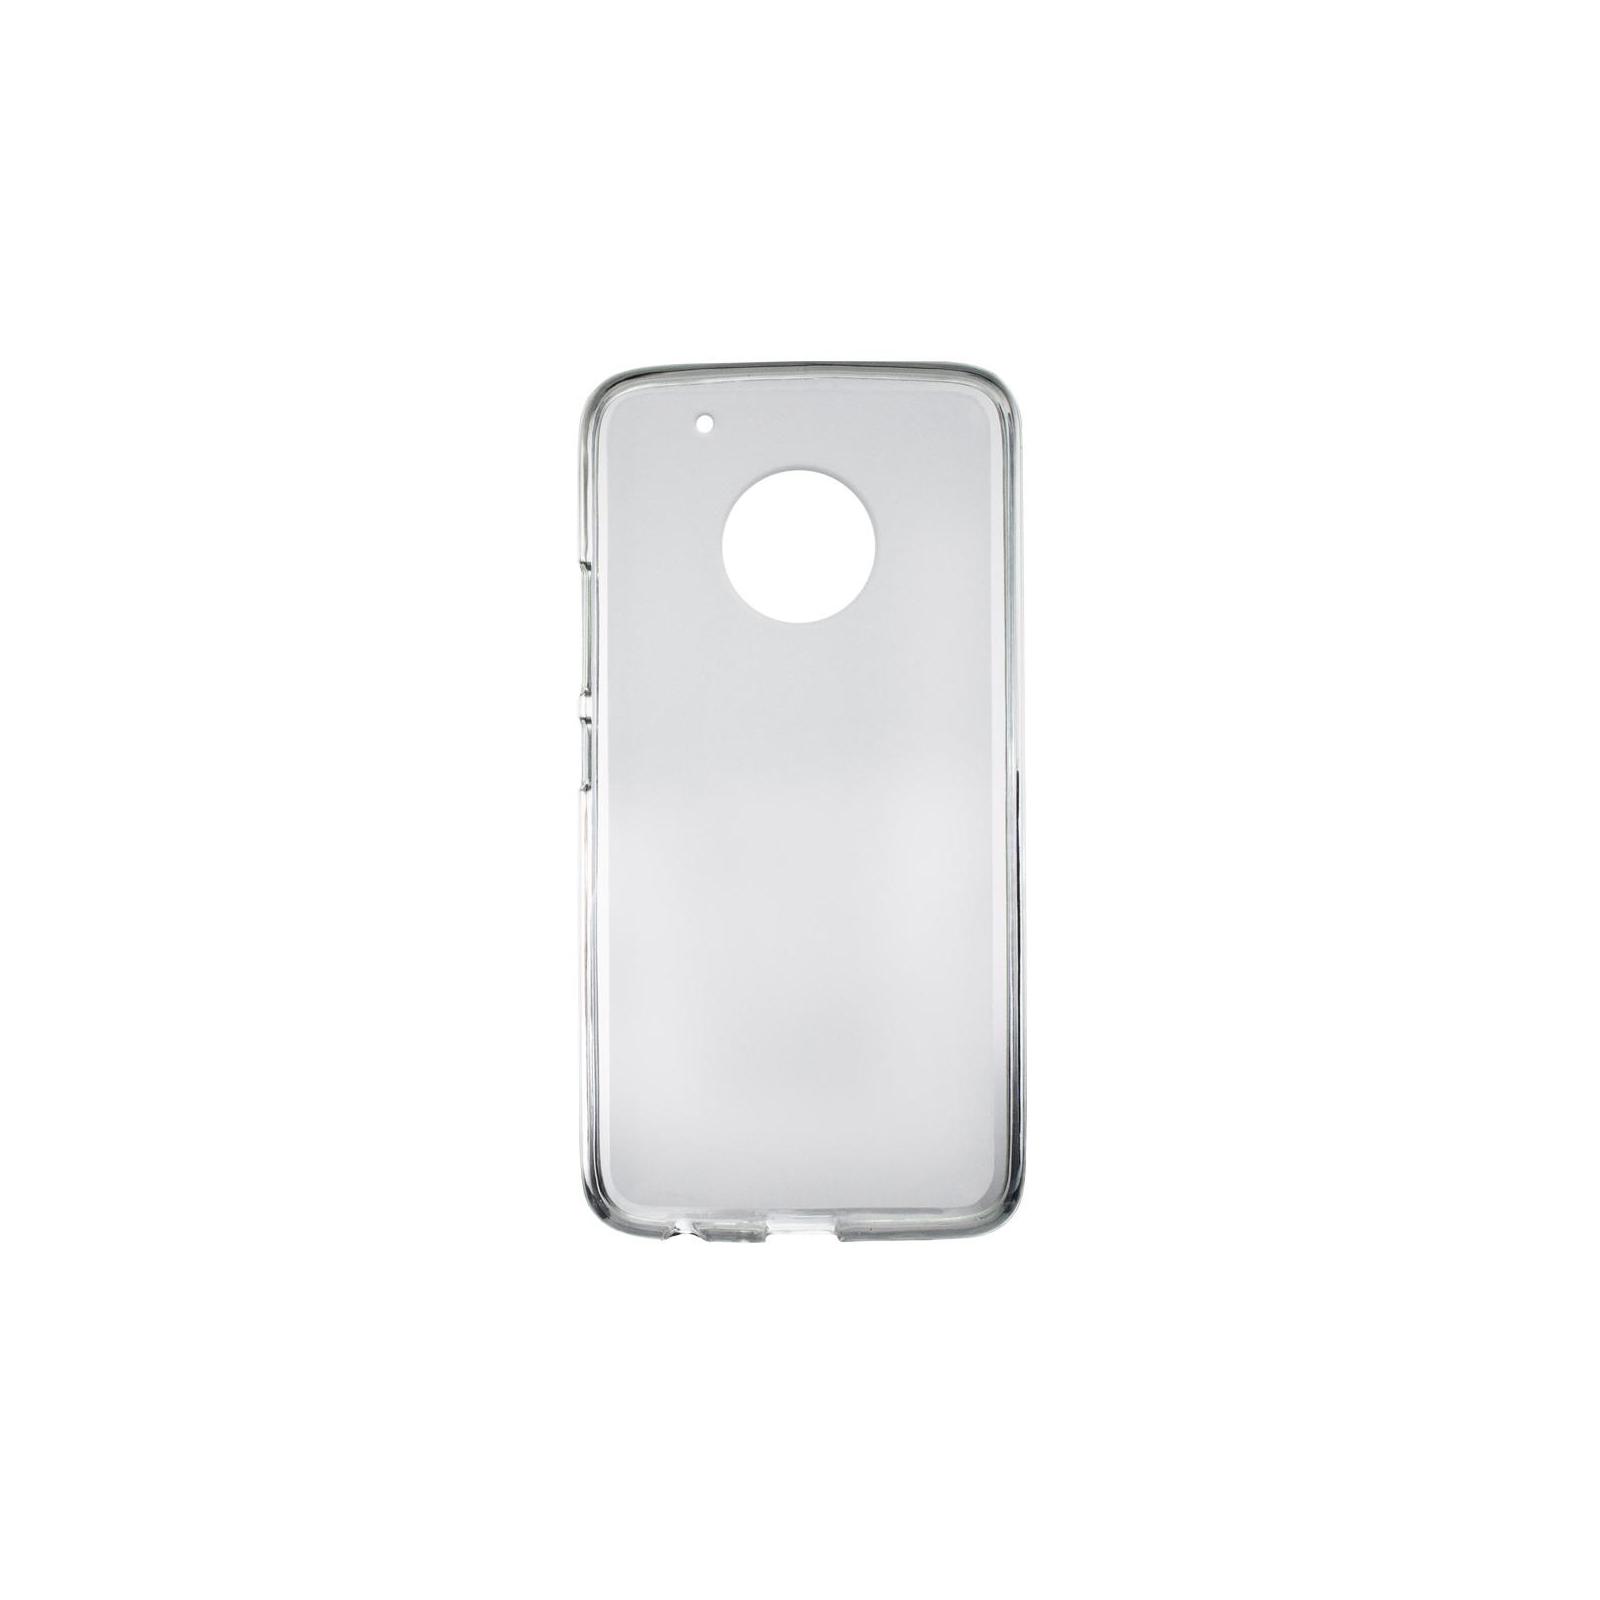 Чехол для моб. телефона Colorway TPU case for Motorola MOTO G5 Plus (XT1685) (CW-CTBMMG5P)